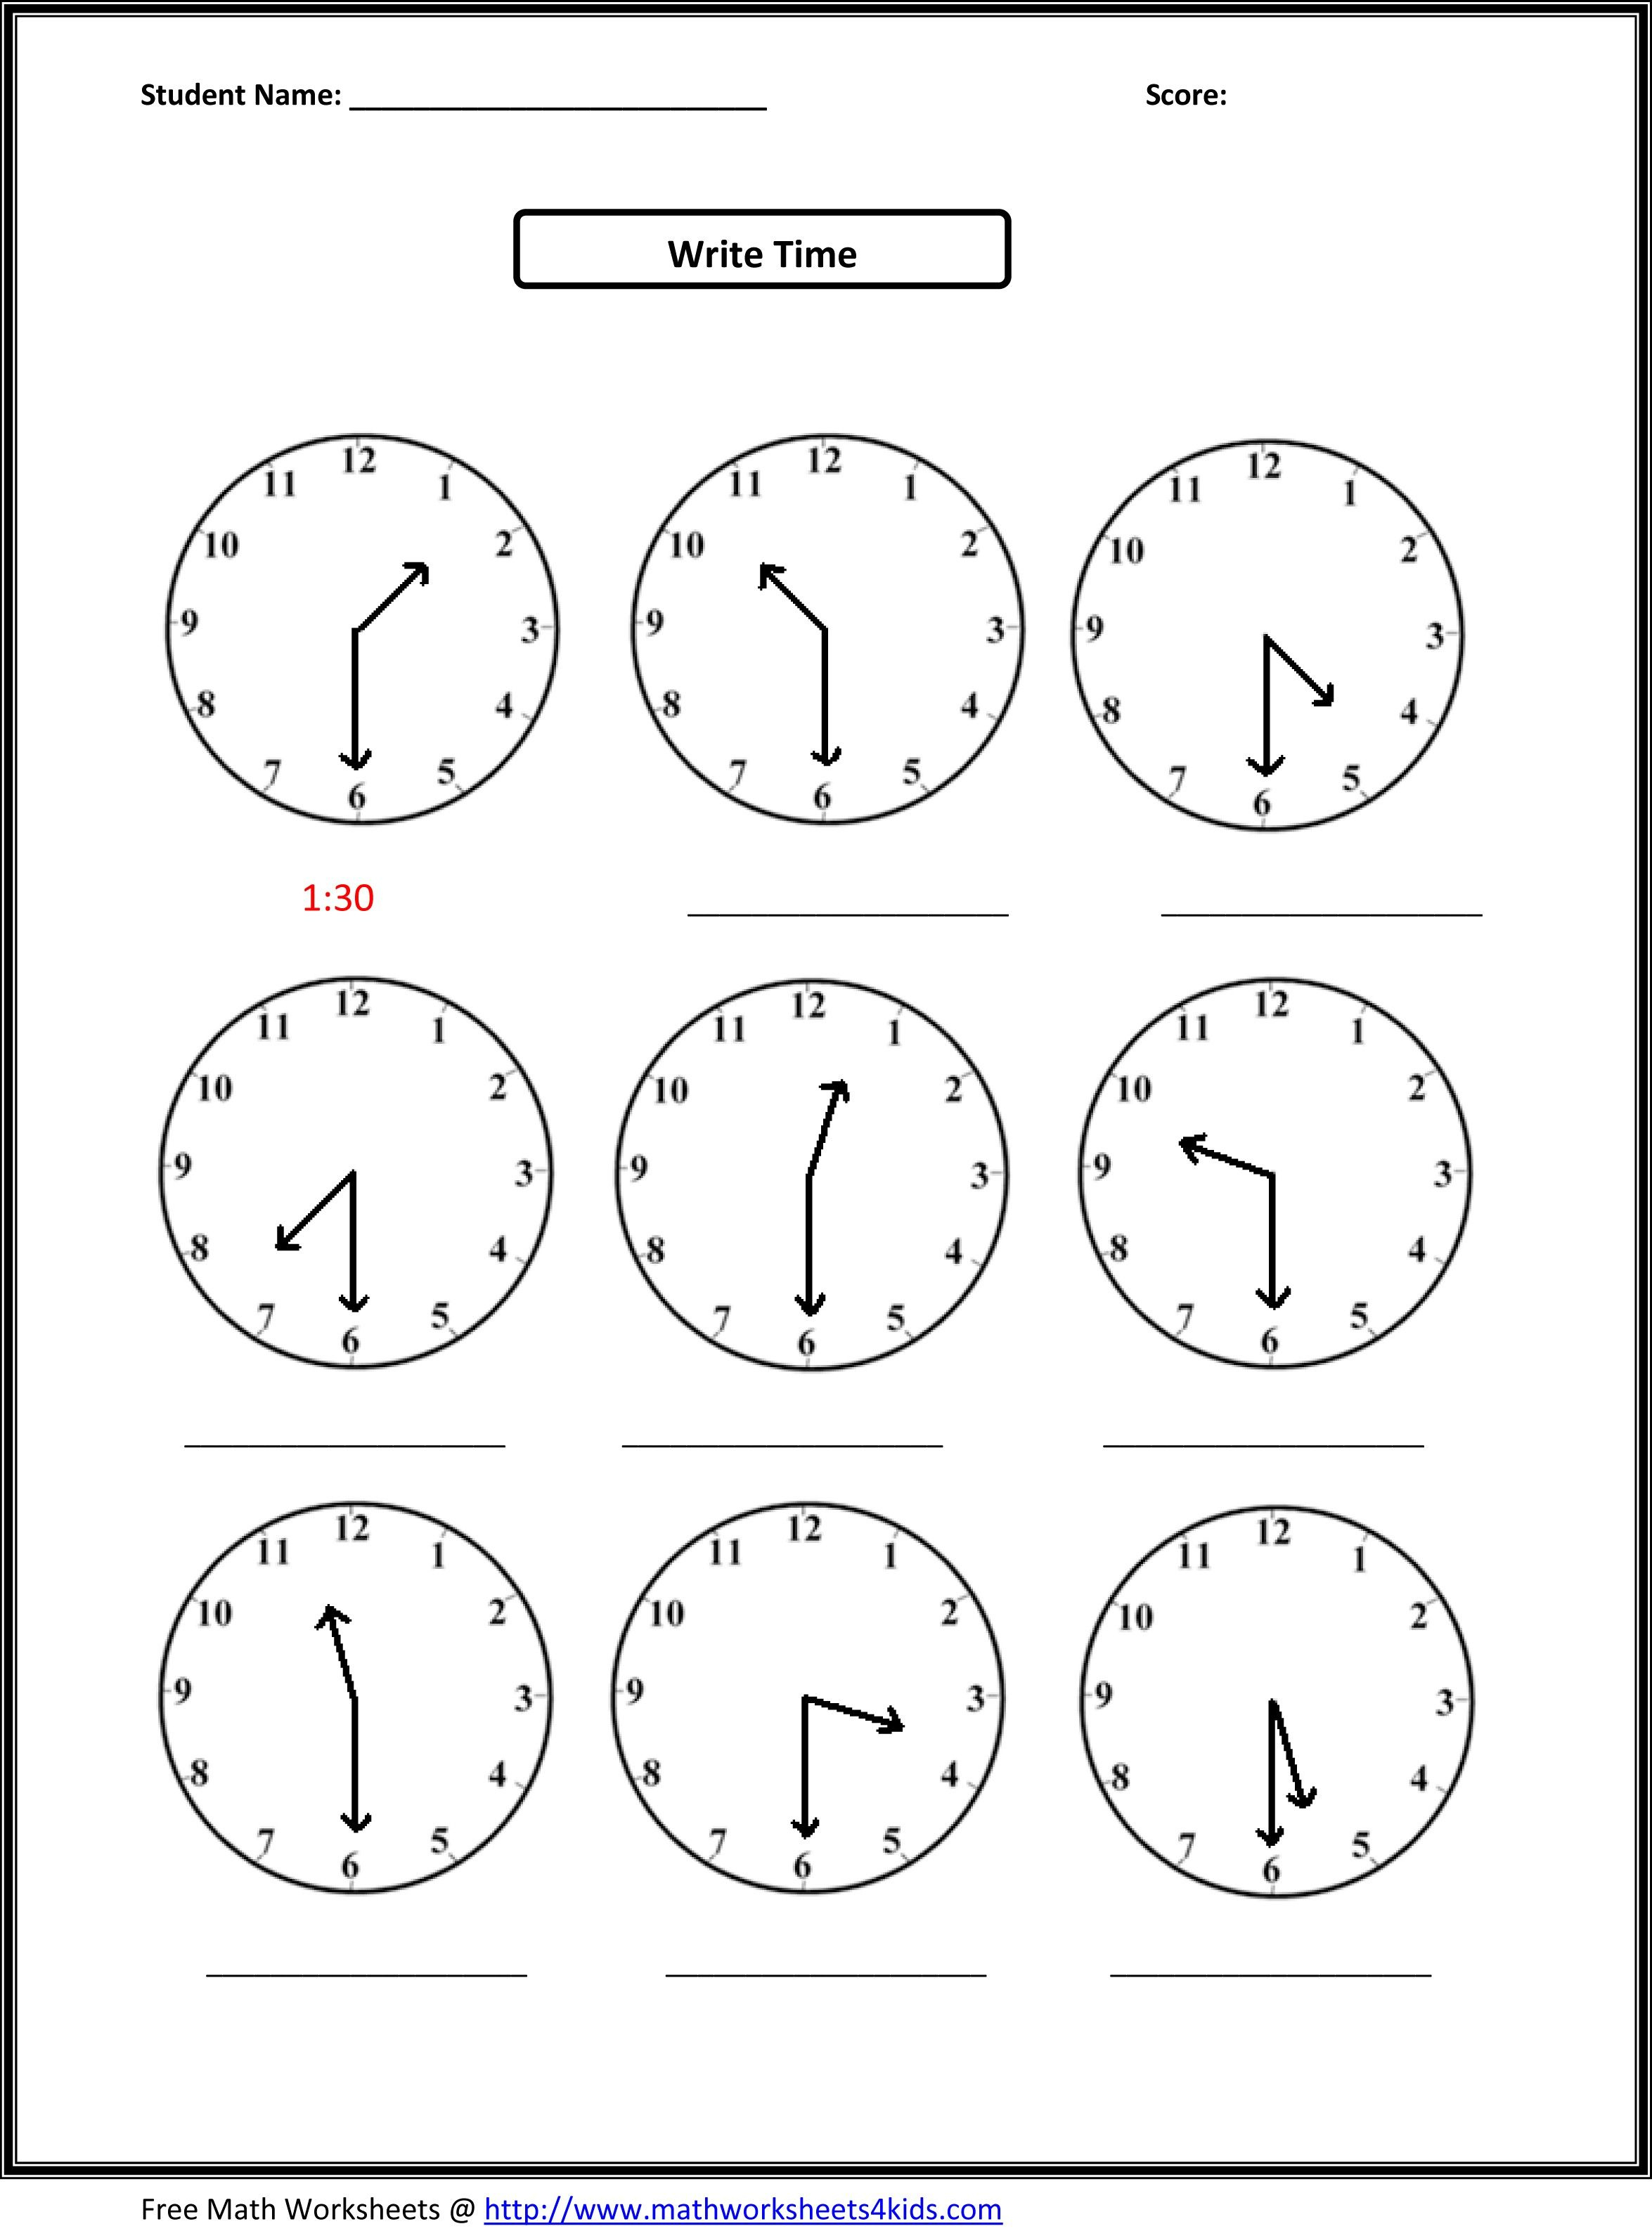 2Nd Grade Free Worksheets Math | Math: Time/measurement | 2Nd Grade | Free Printable Second Grade Math Worksheets